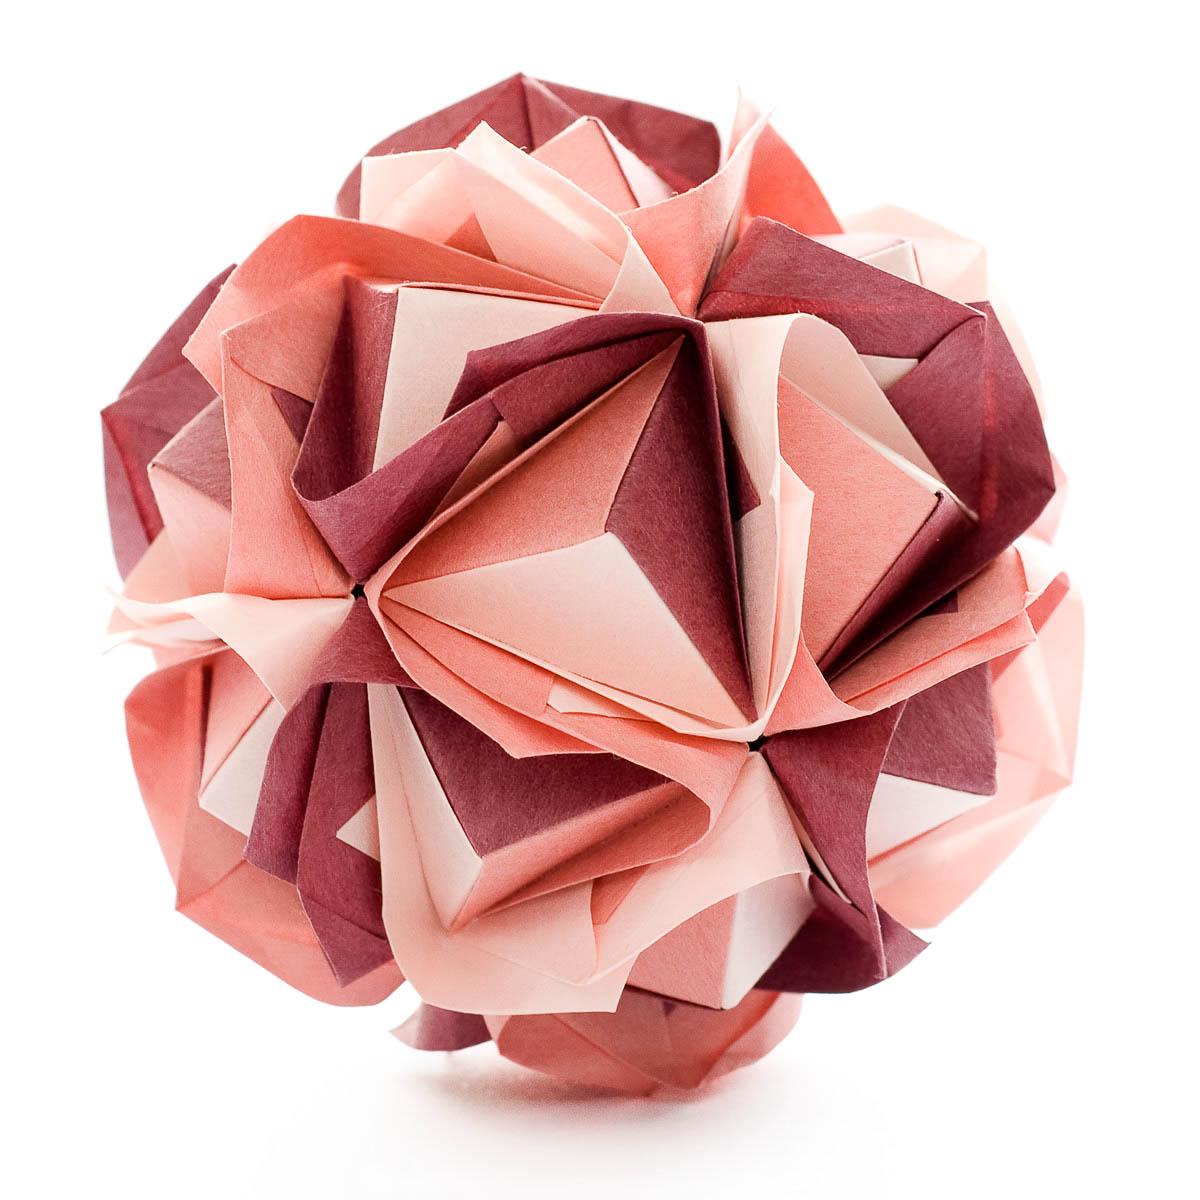 origami flower instruction diagram lutron wiring grafik eye clover kusudama by maria sinayskaya  go